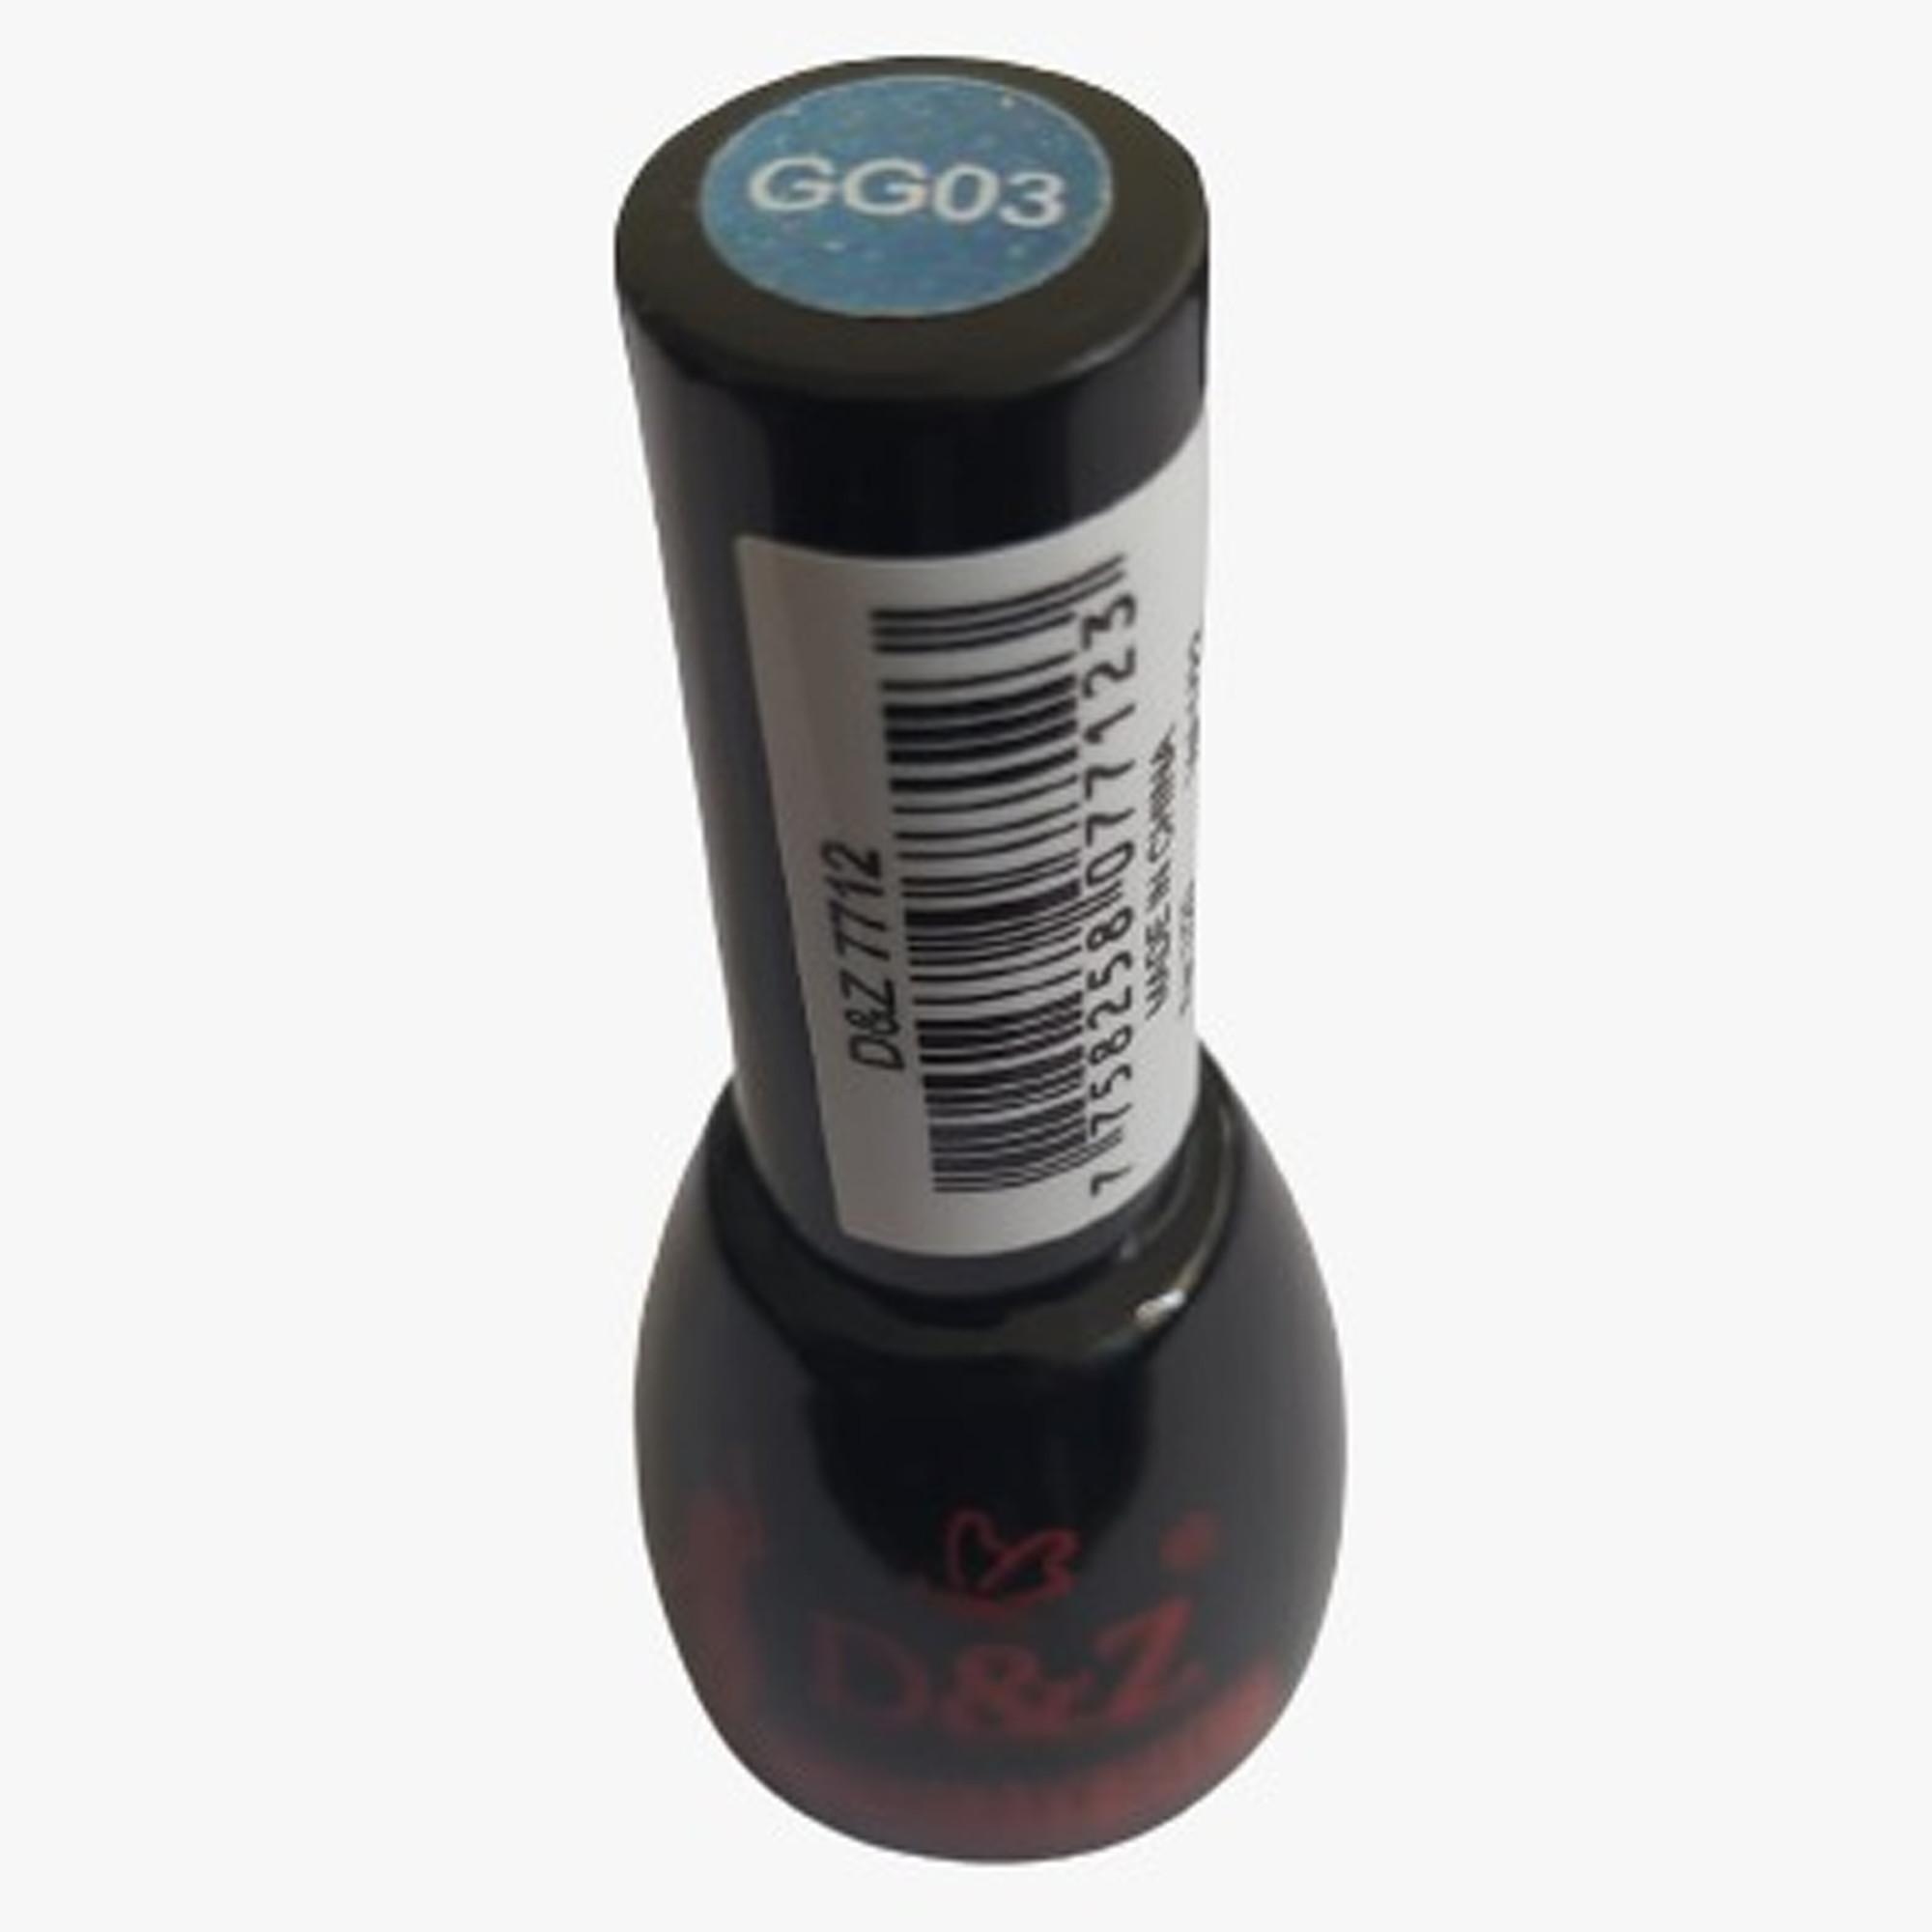 Esmalte Gel Vitral D&Z Glitter – 12 ML – GG03